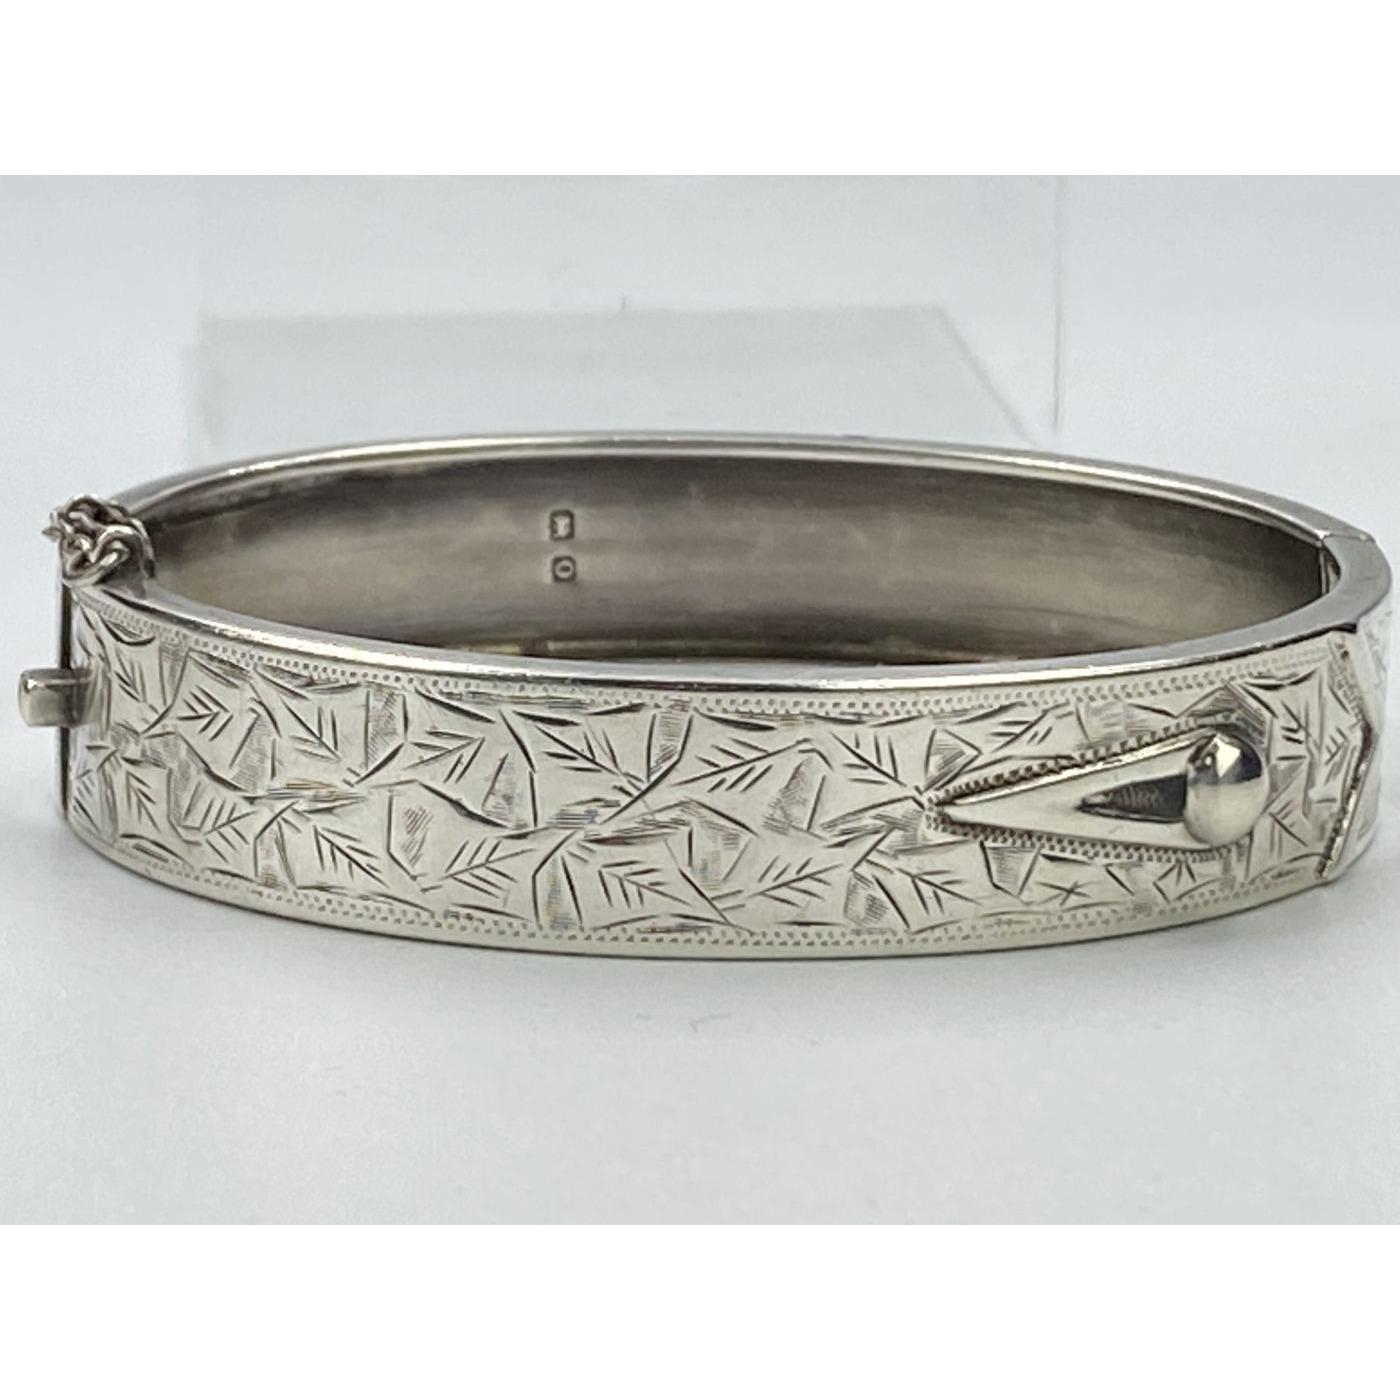 Narrow Shirt Cuff English Silver Antique Bangle